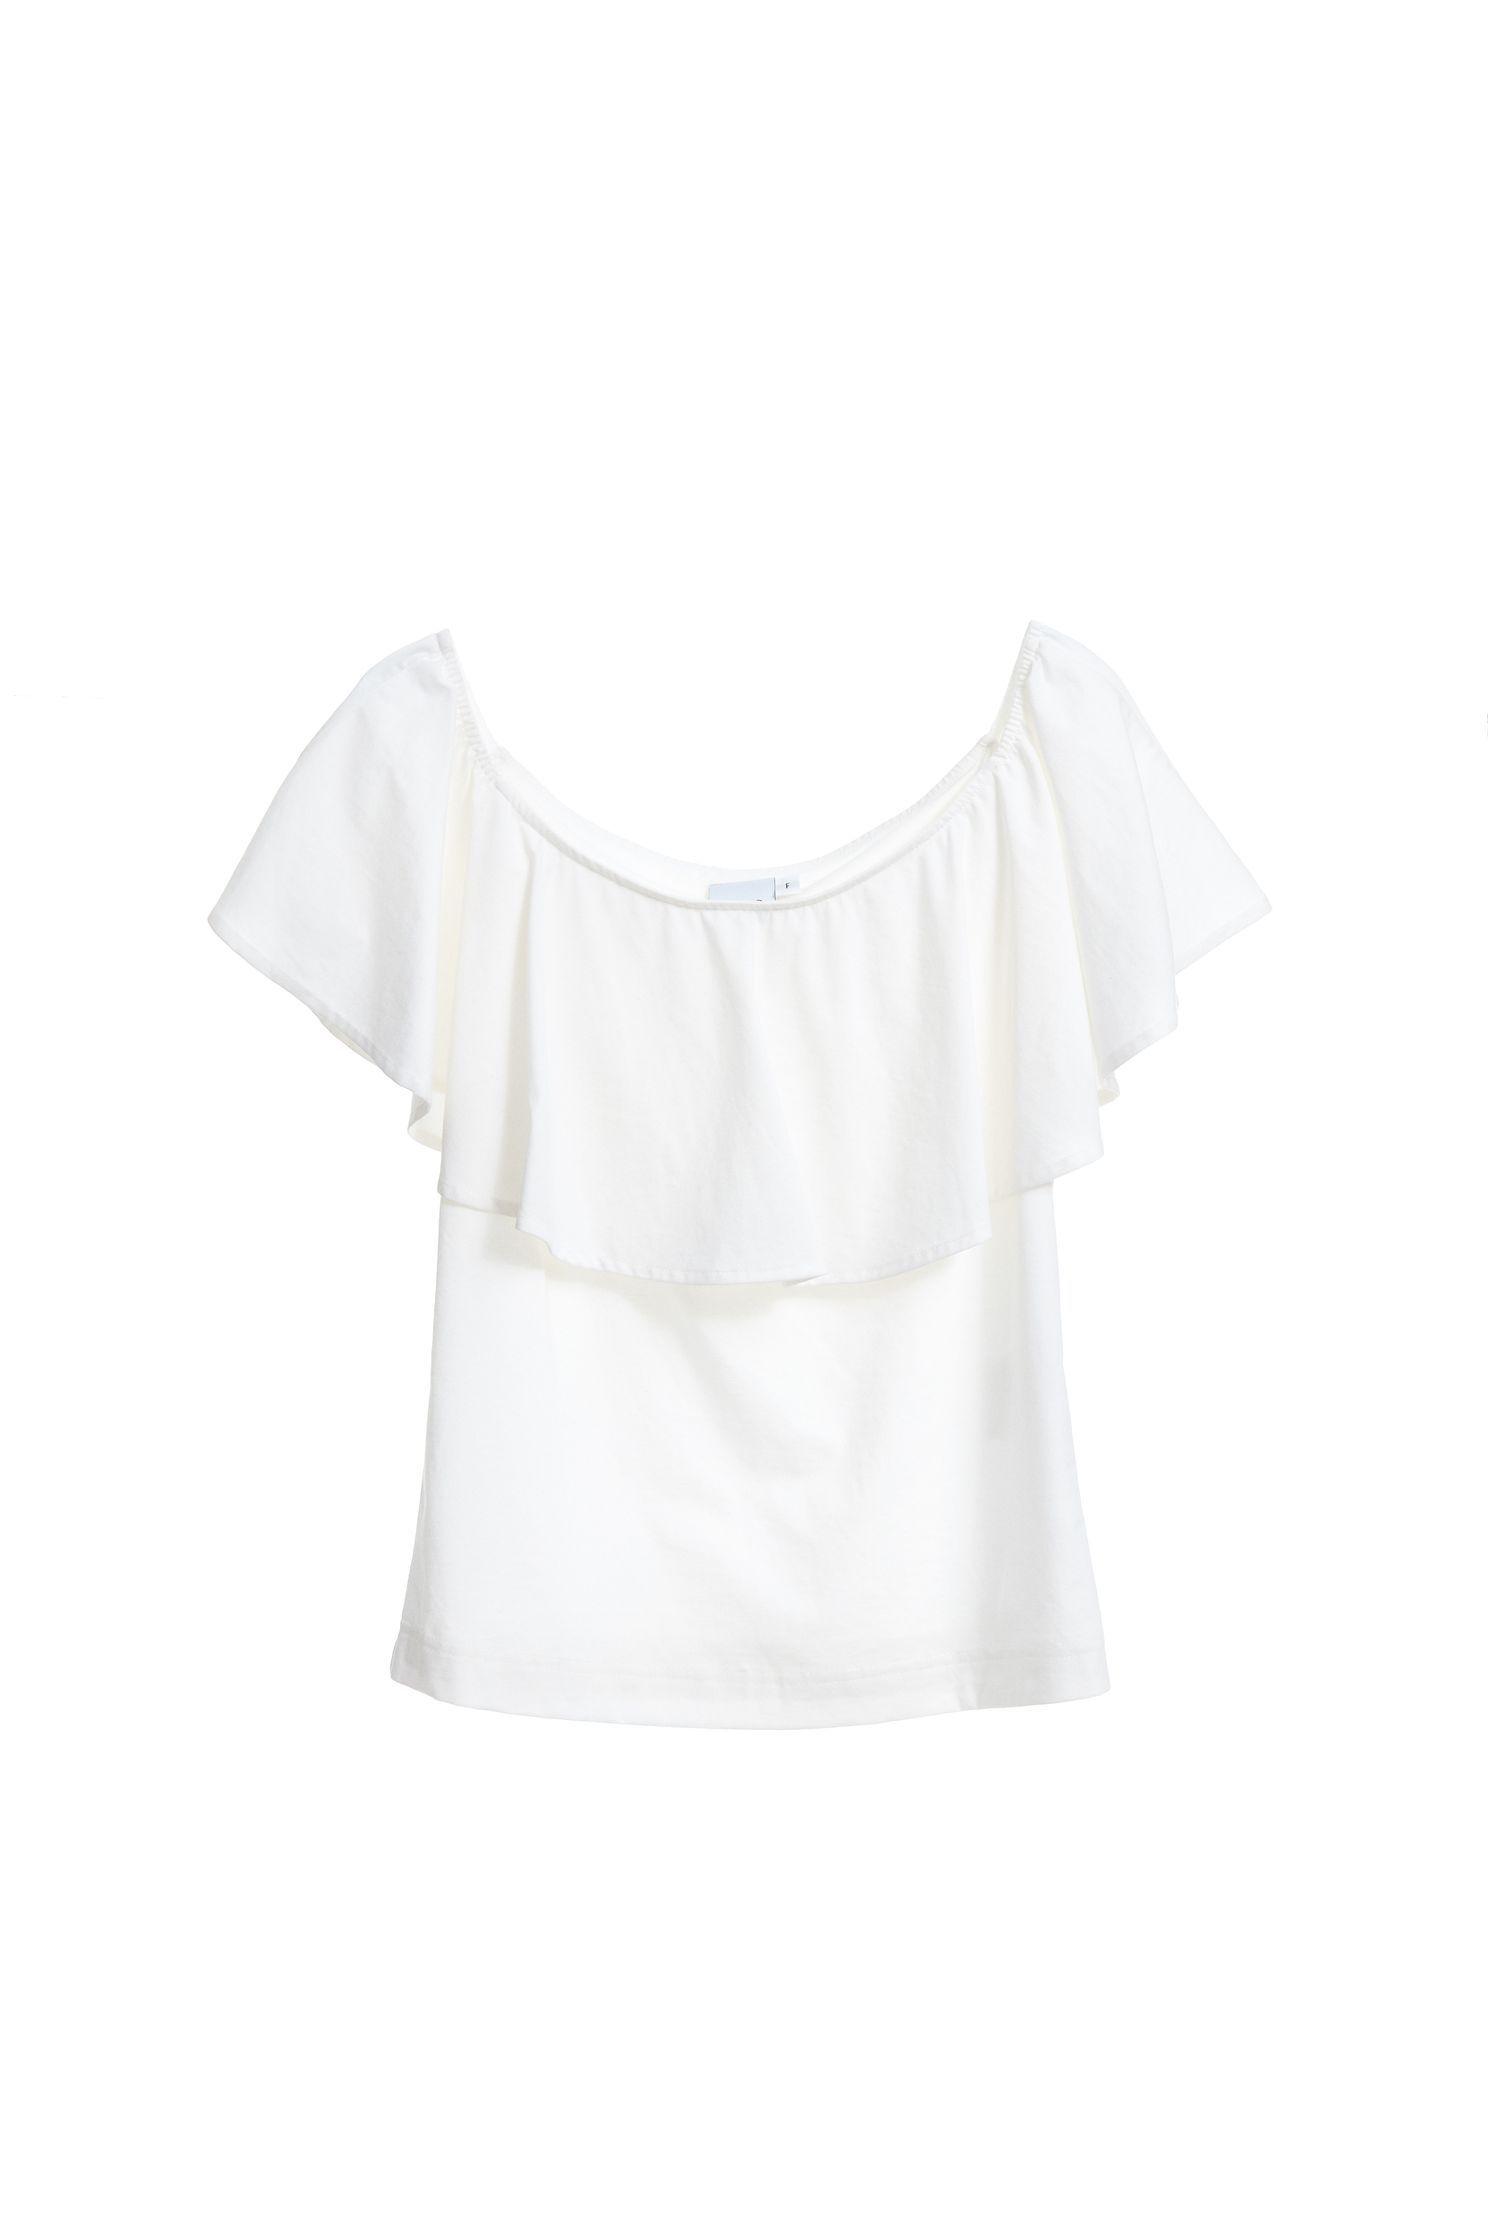 Wavy collar fashion top